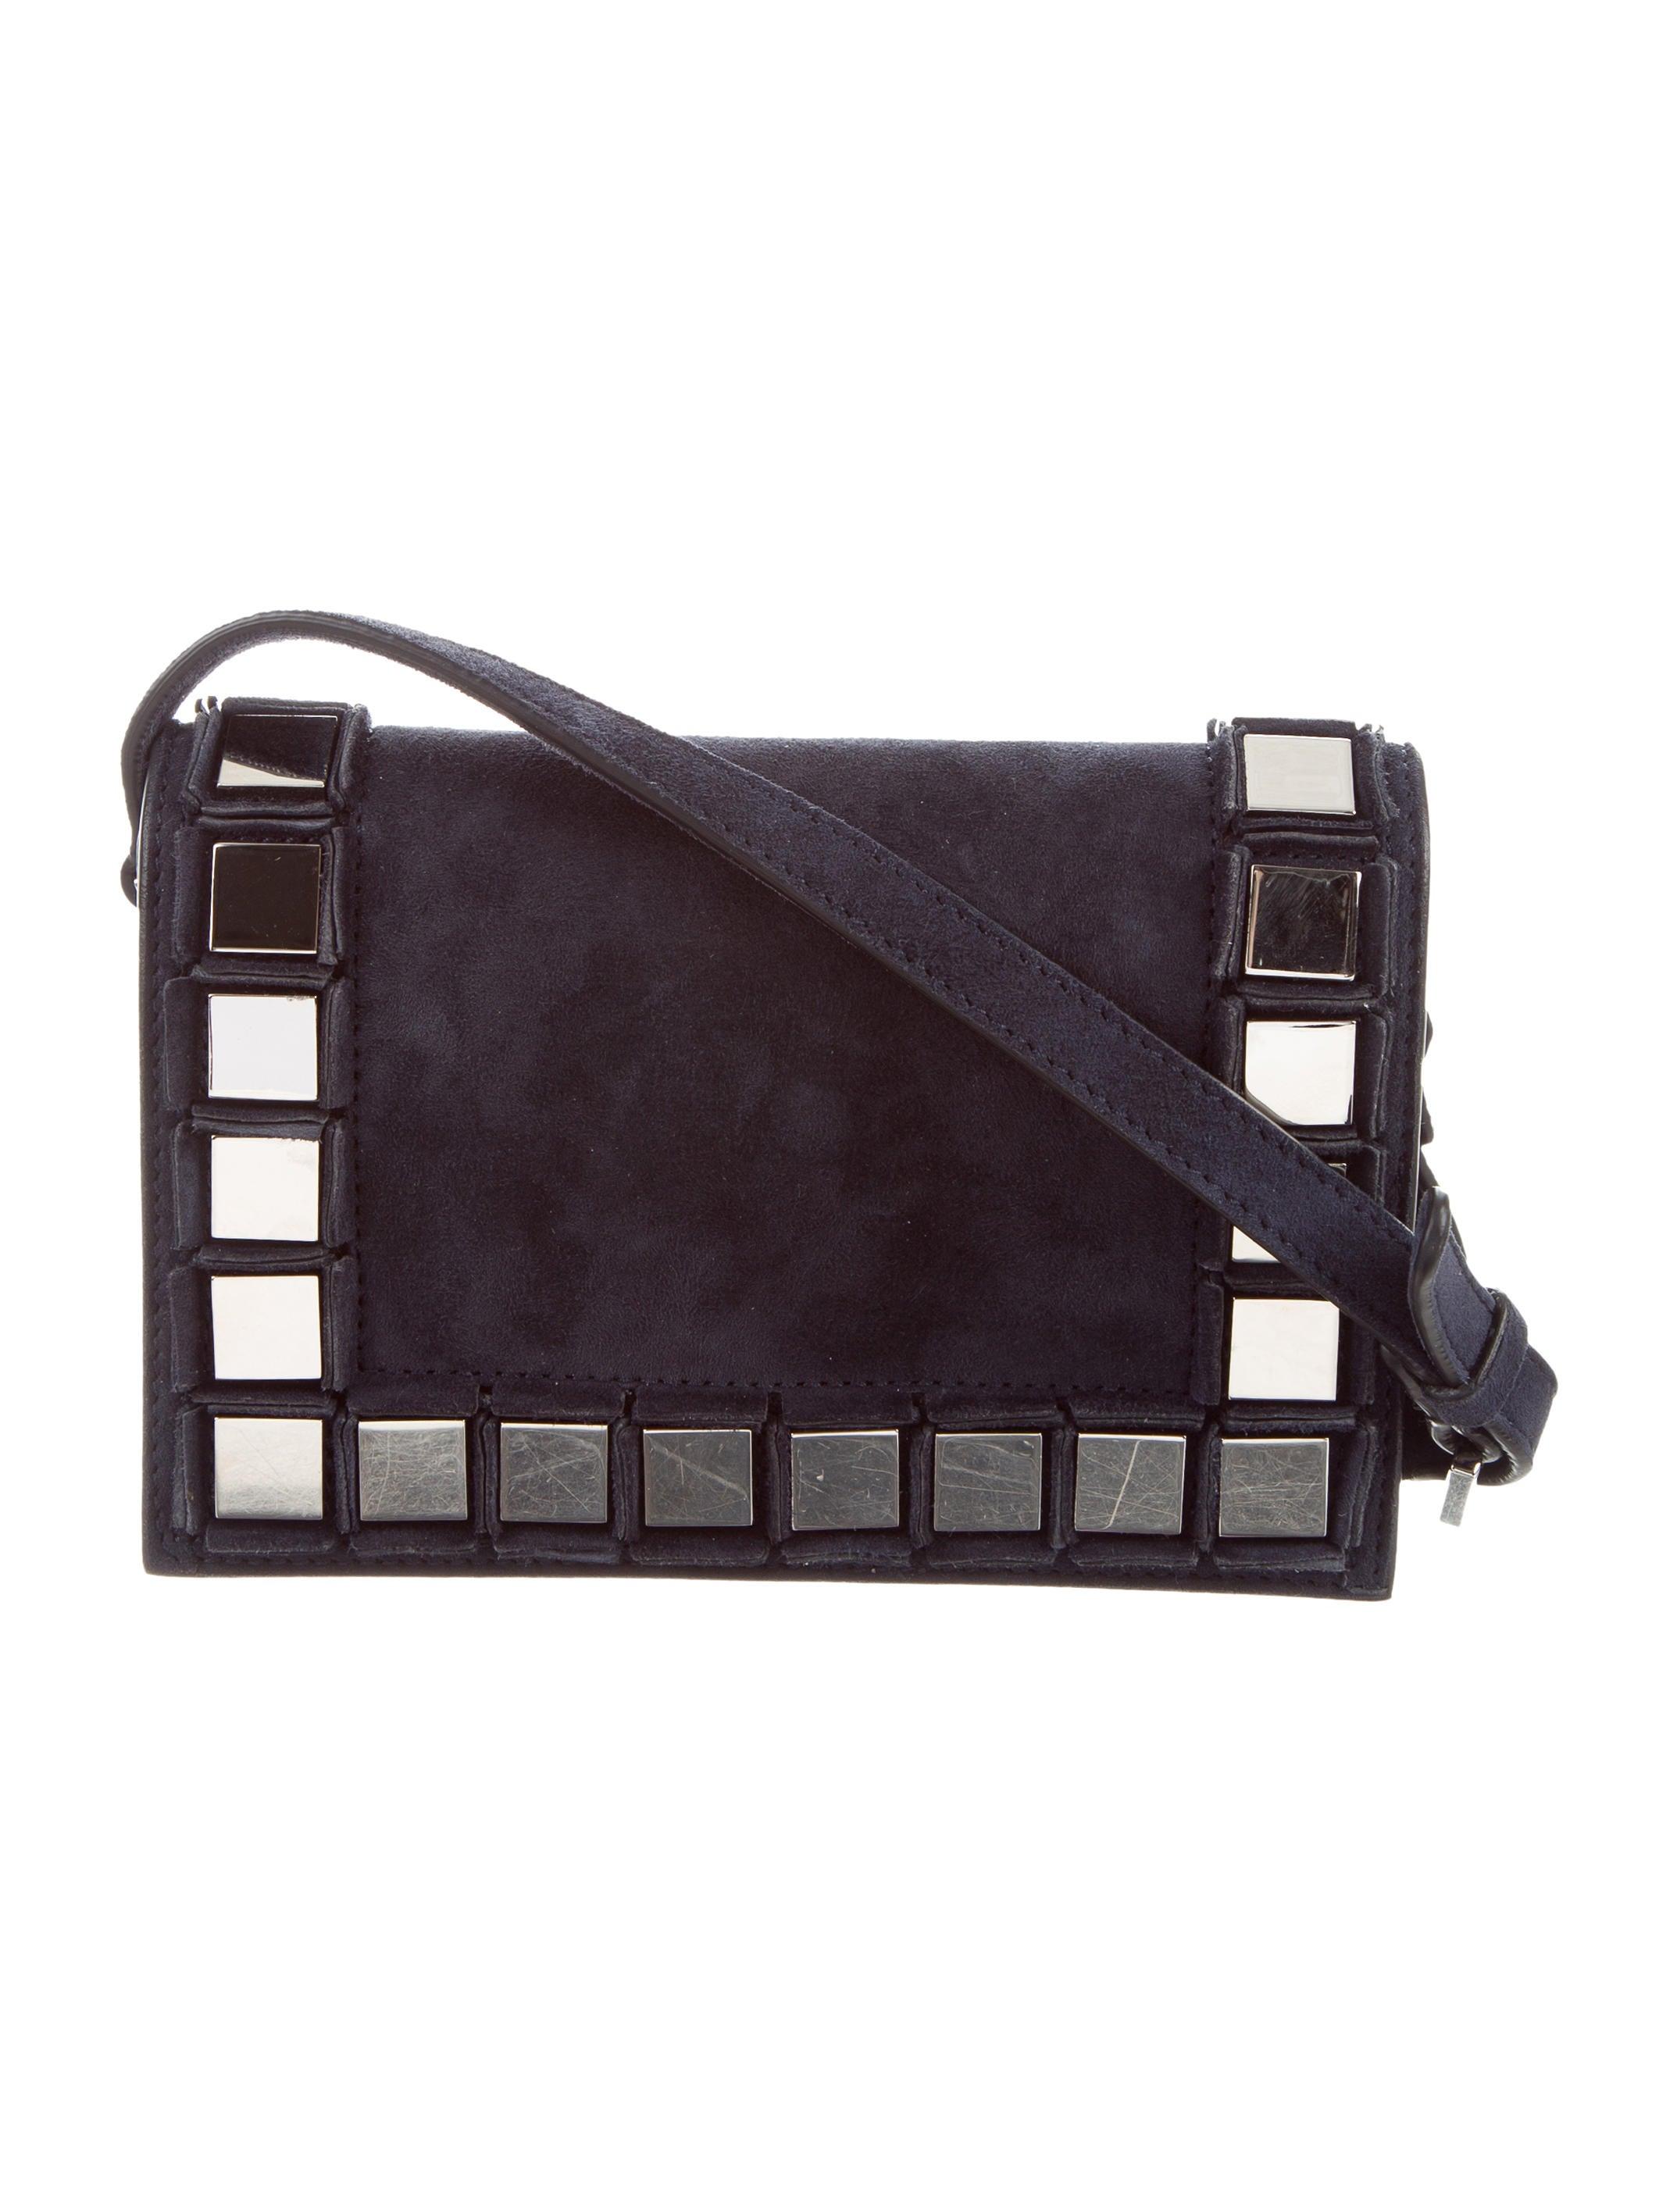 BAGS - Handbags Tomasini Paris 1kkhRX